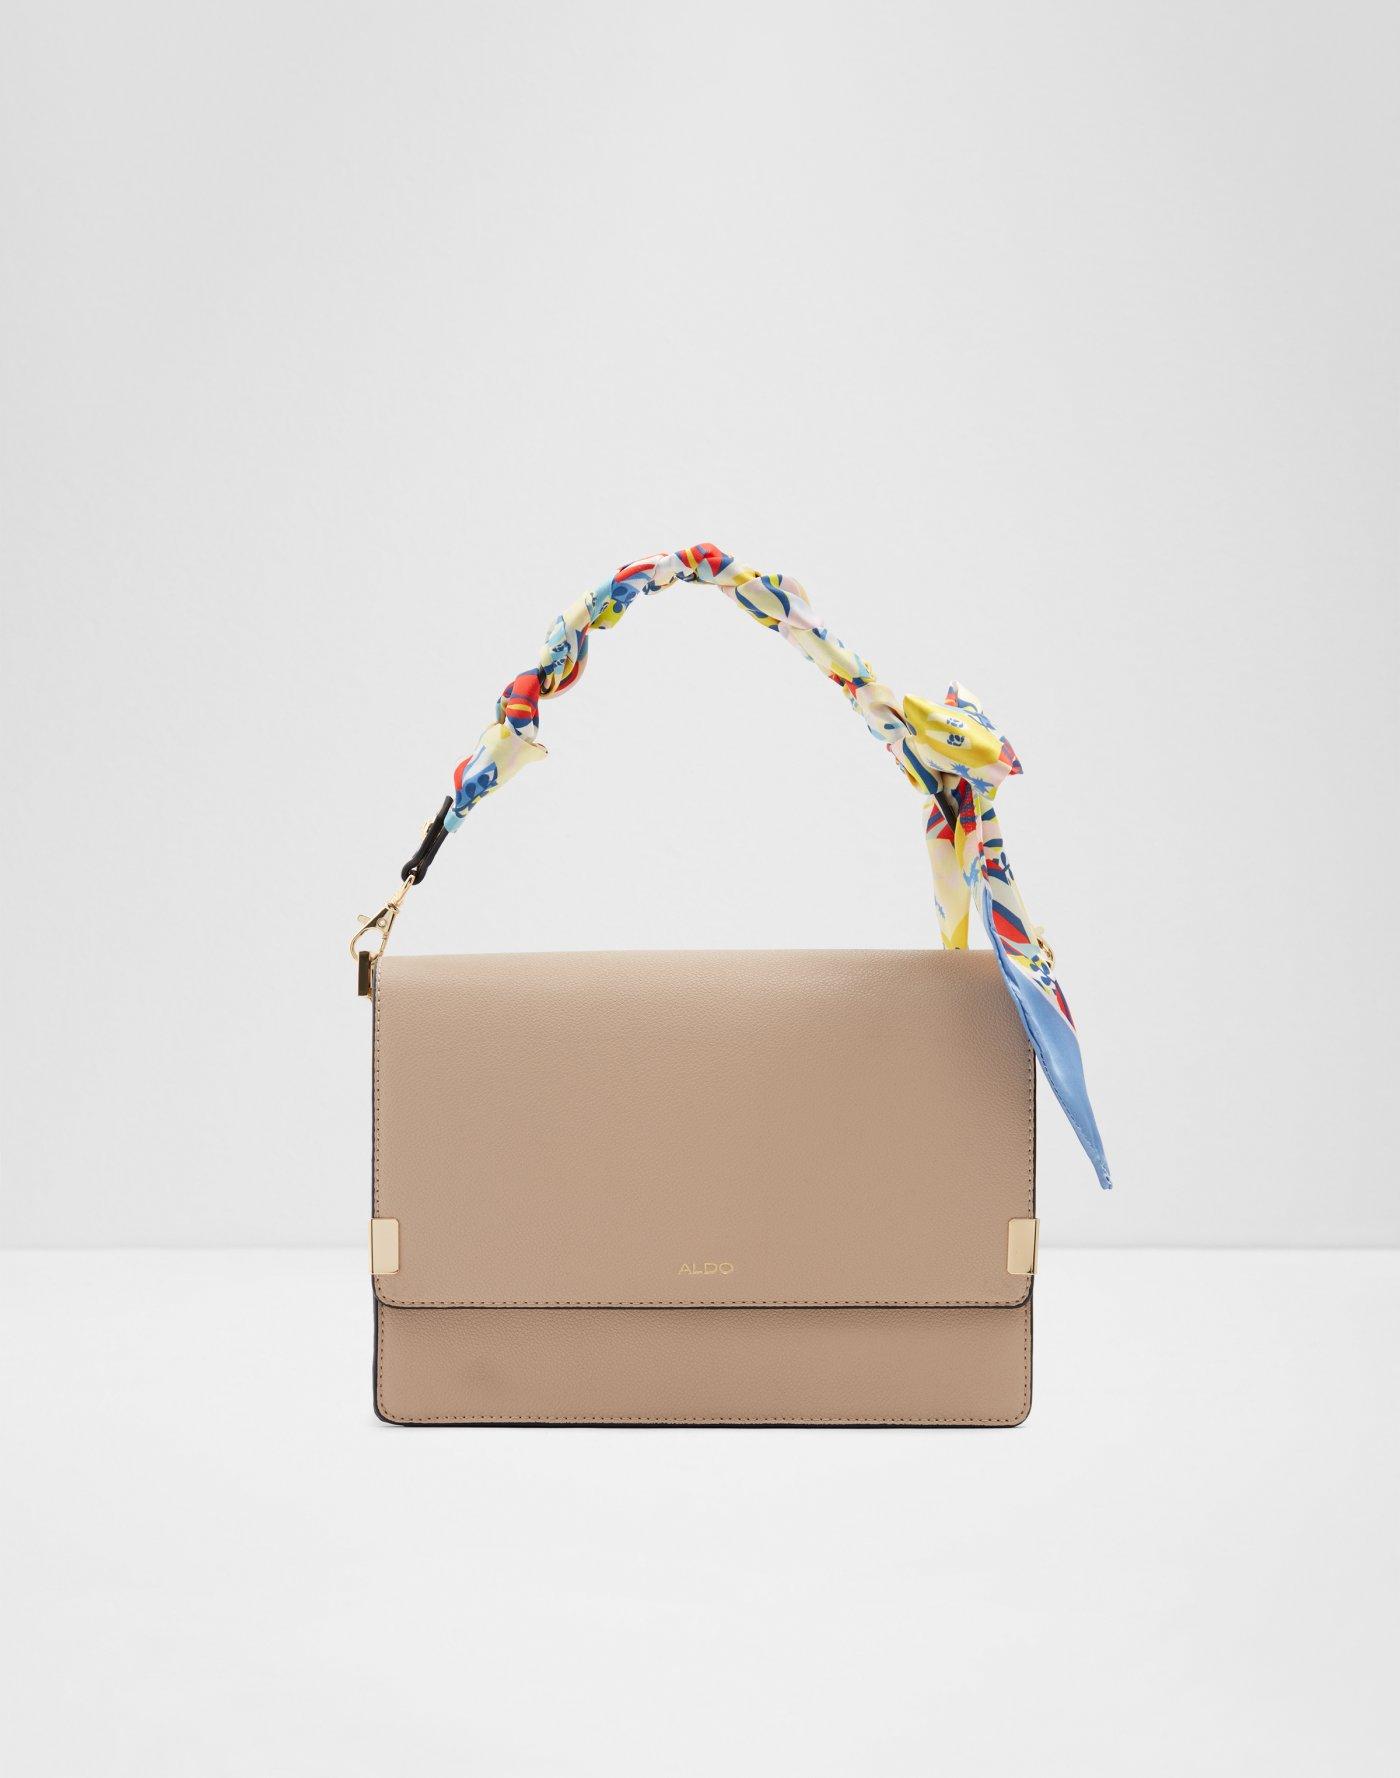 c3ed7e4435 All Handbags